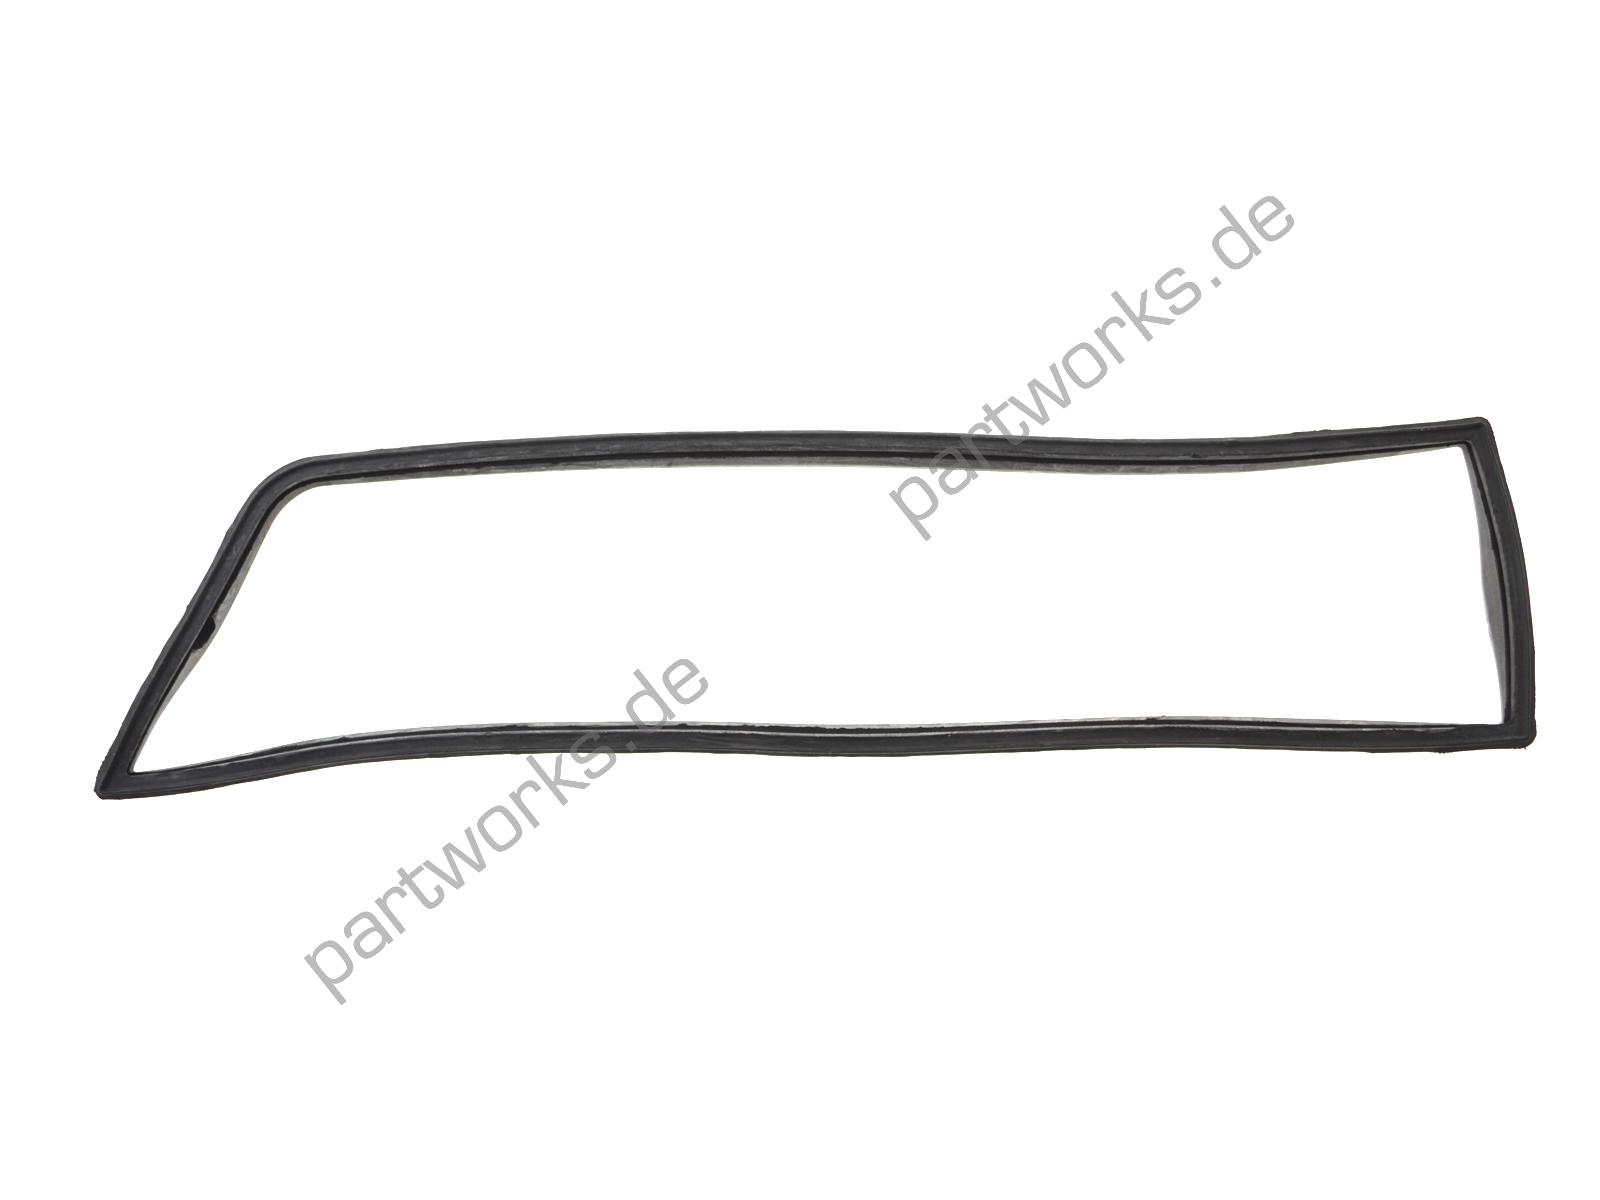 Dichtung für Porsche 911 F/G Rückleuchte LINKS